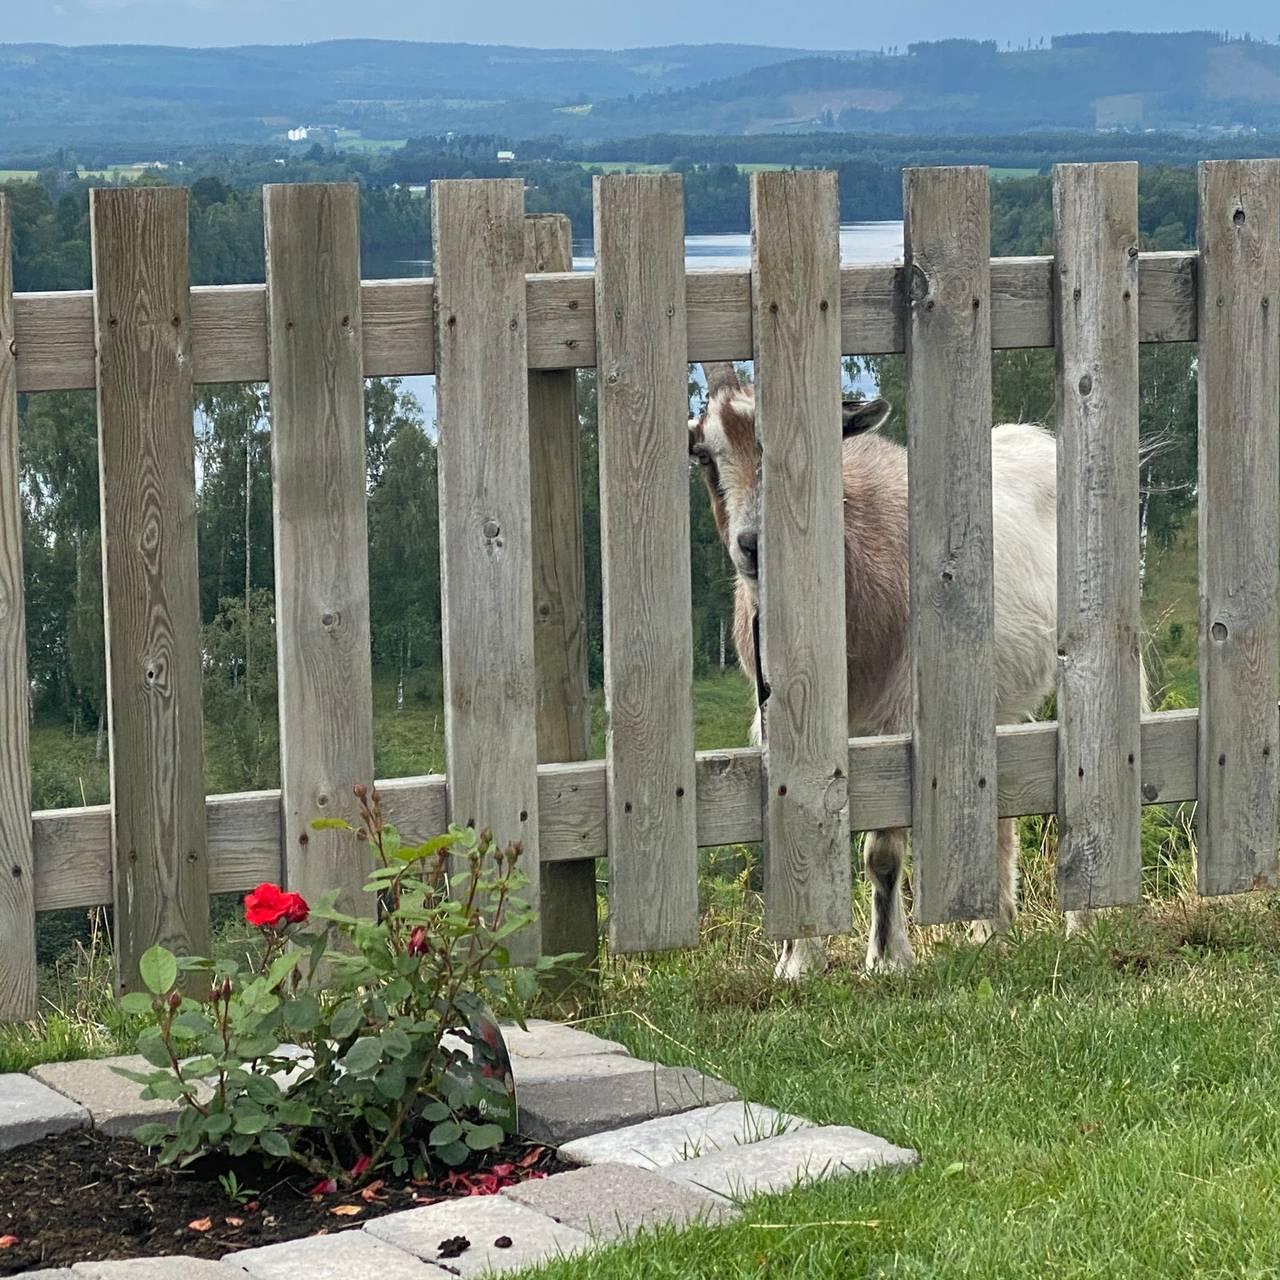 En geit står bak et gjerde.